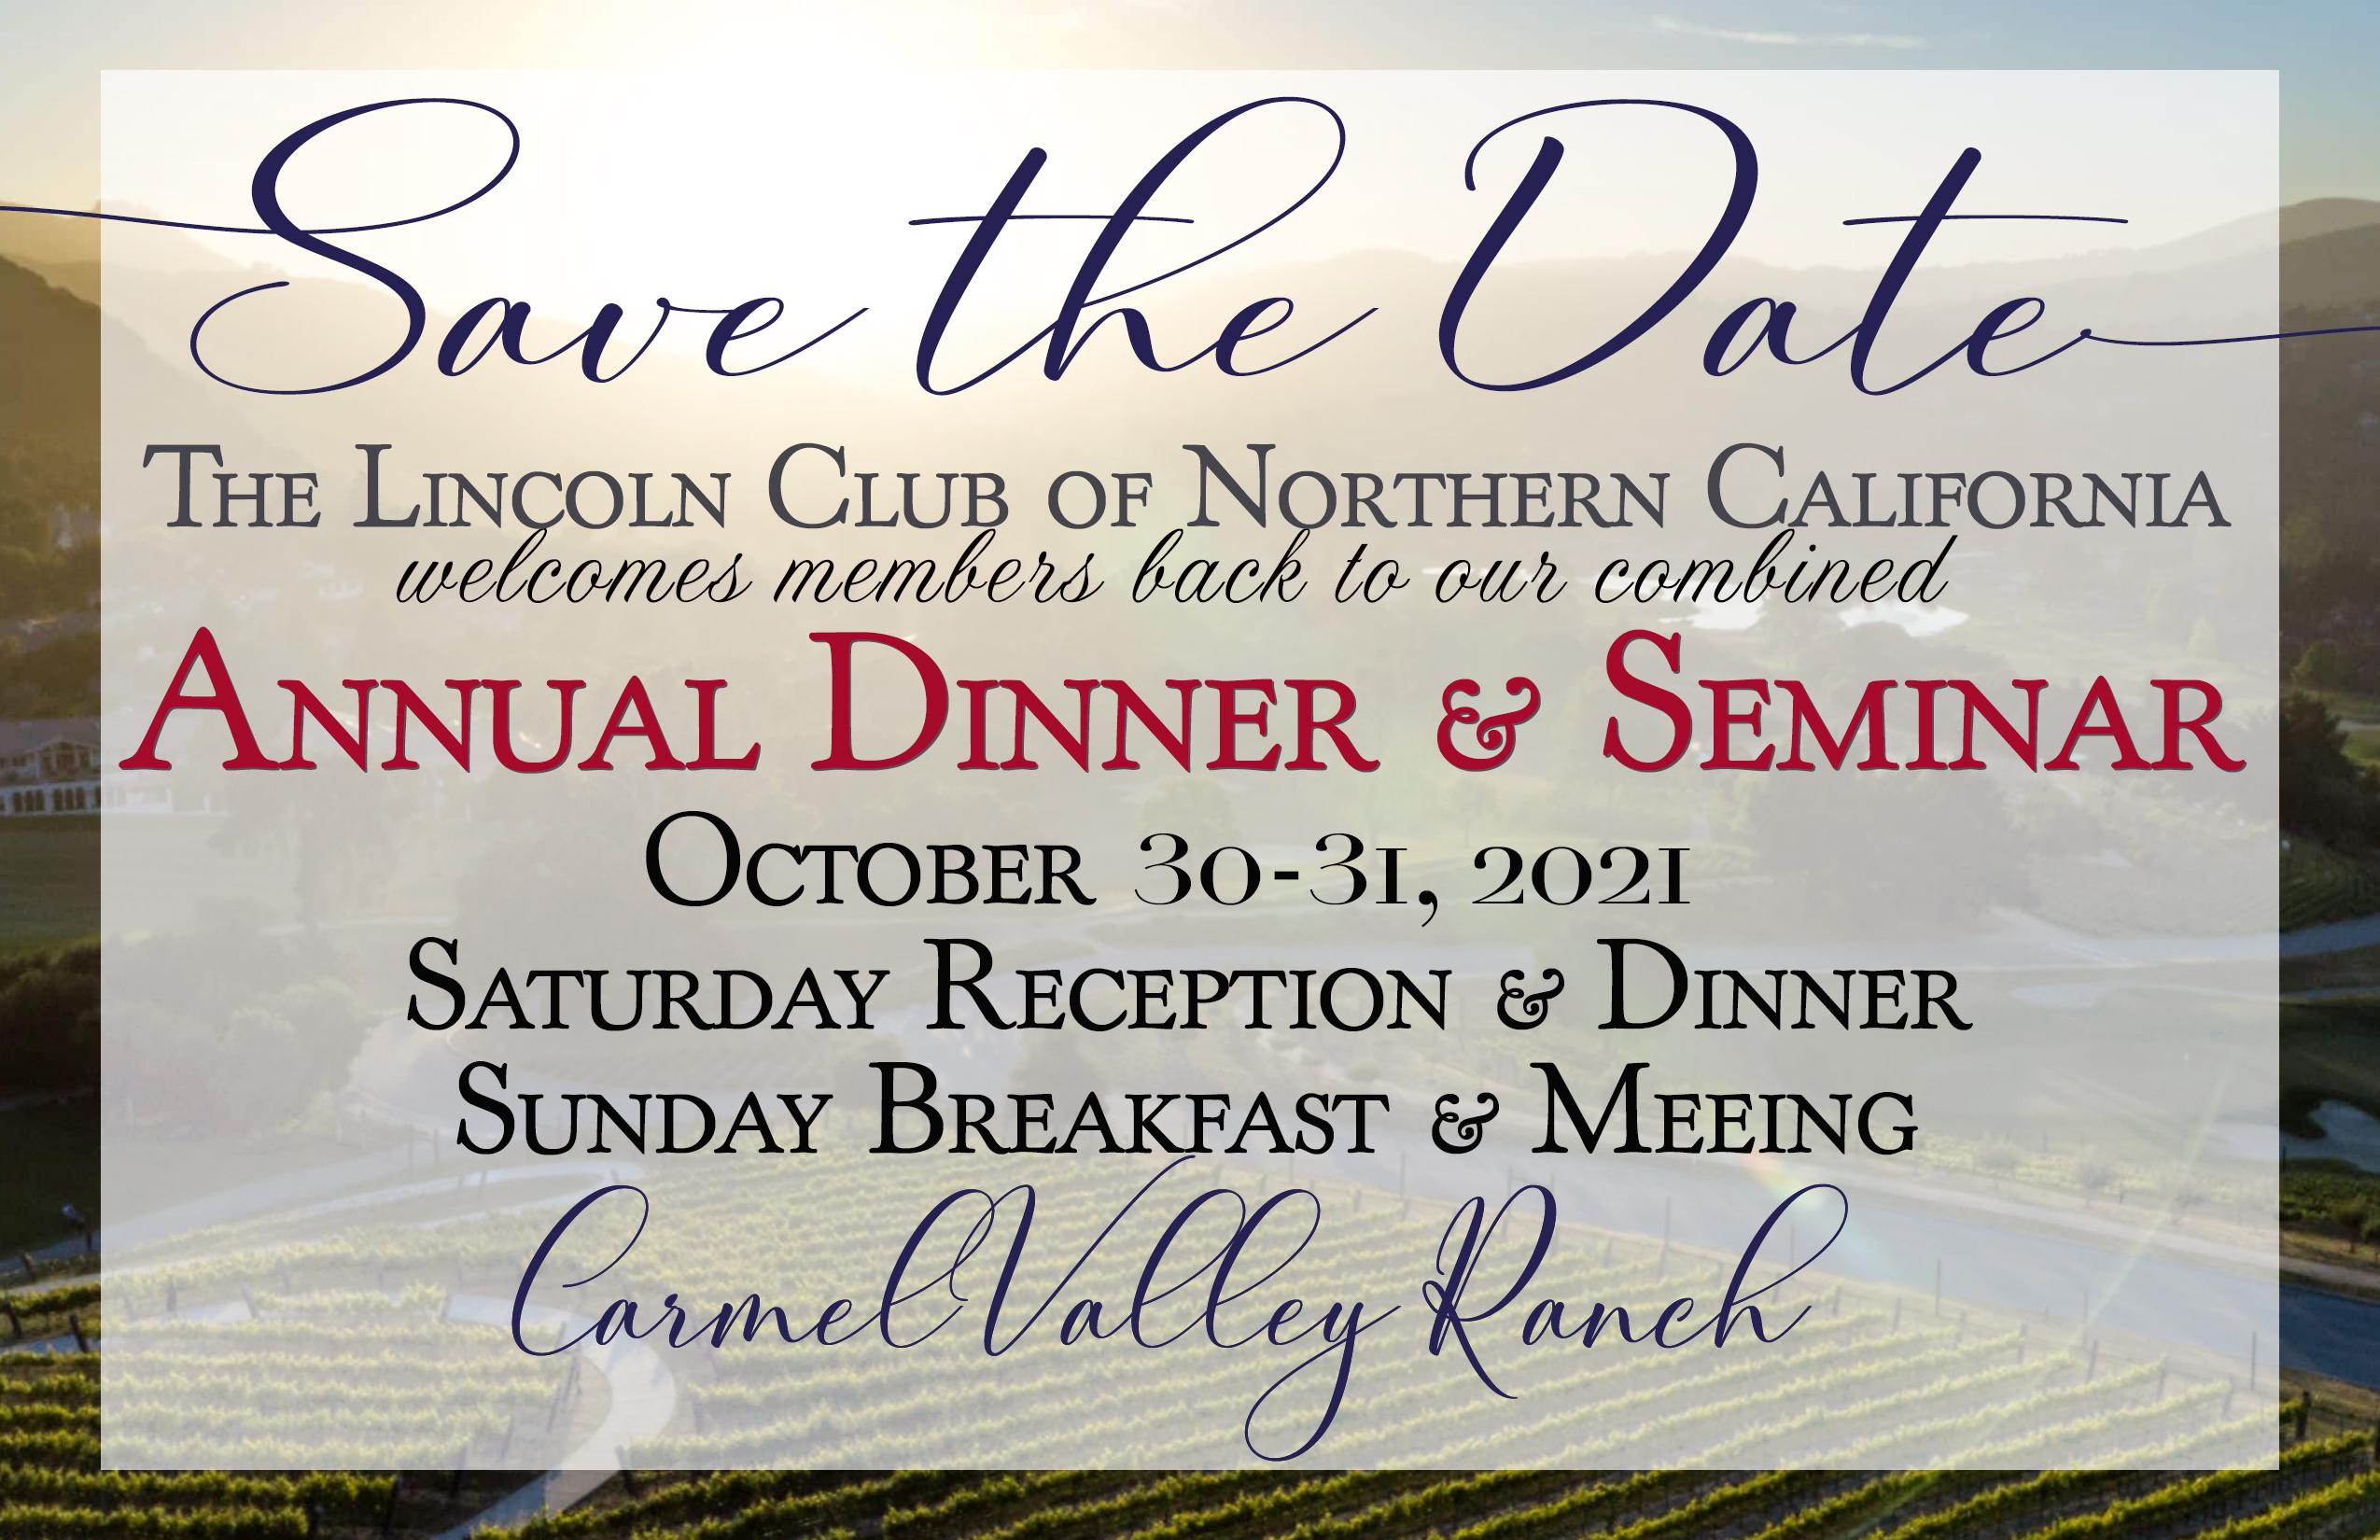 Annual Dinner & Seminar Save the Date